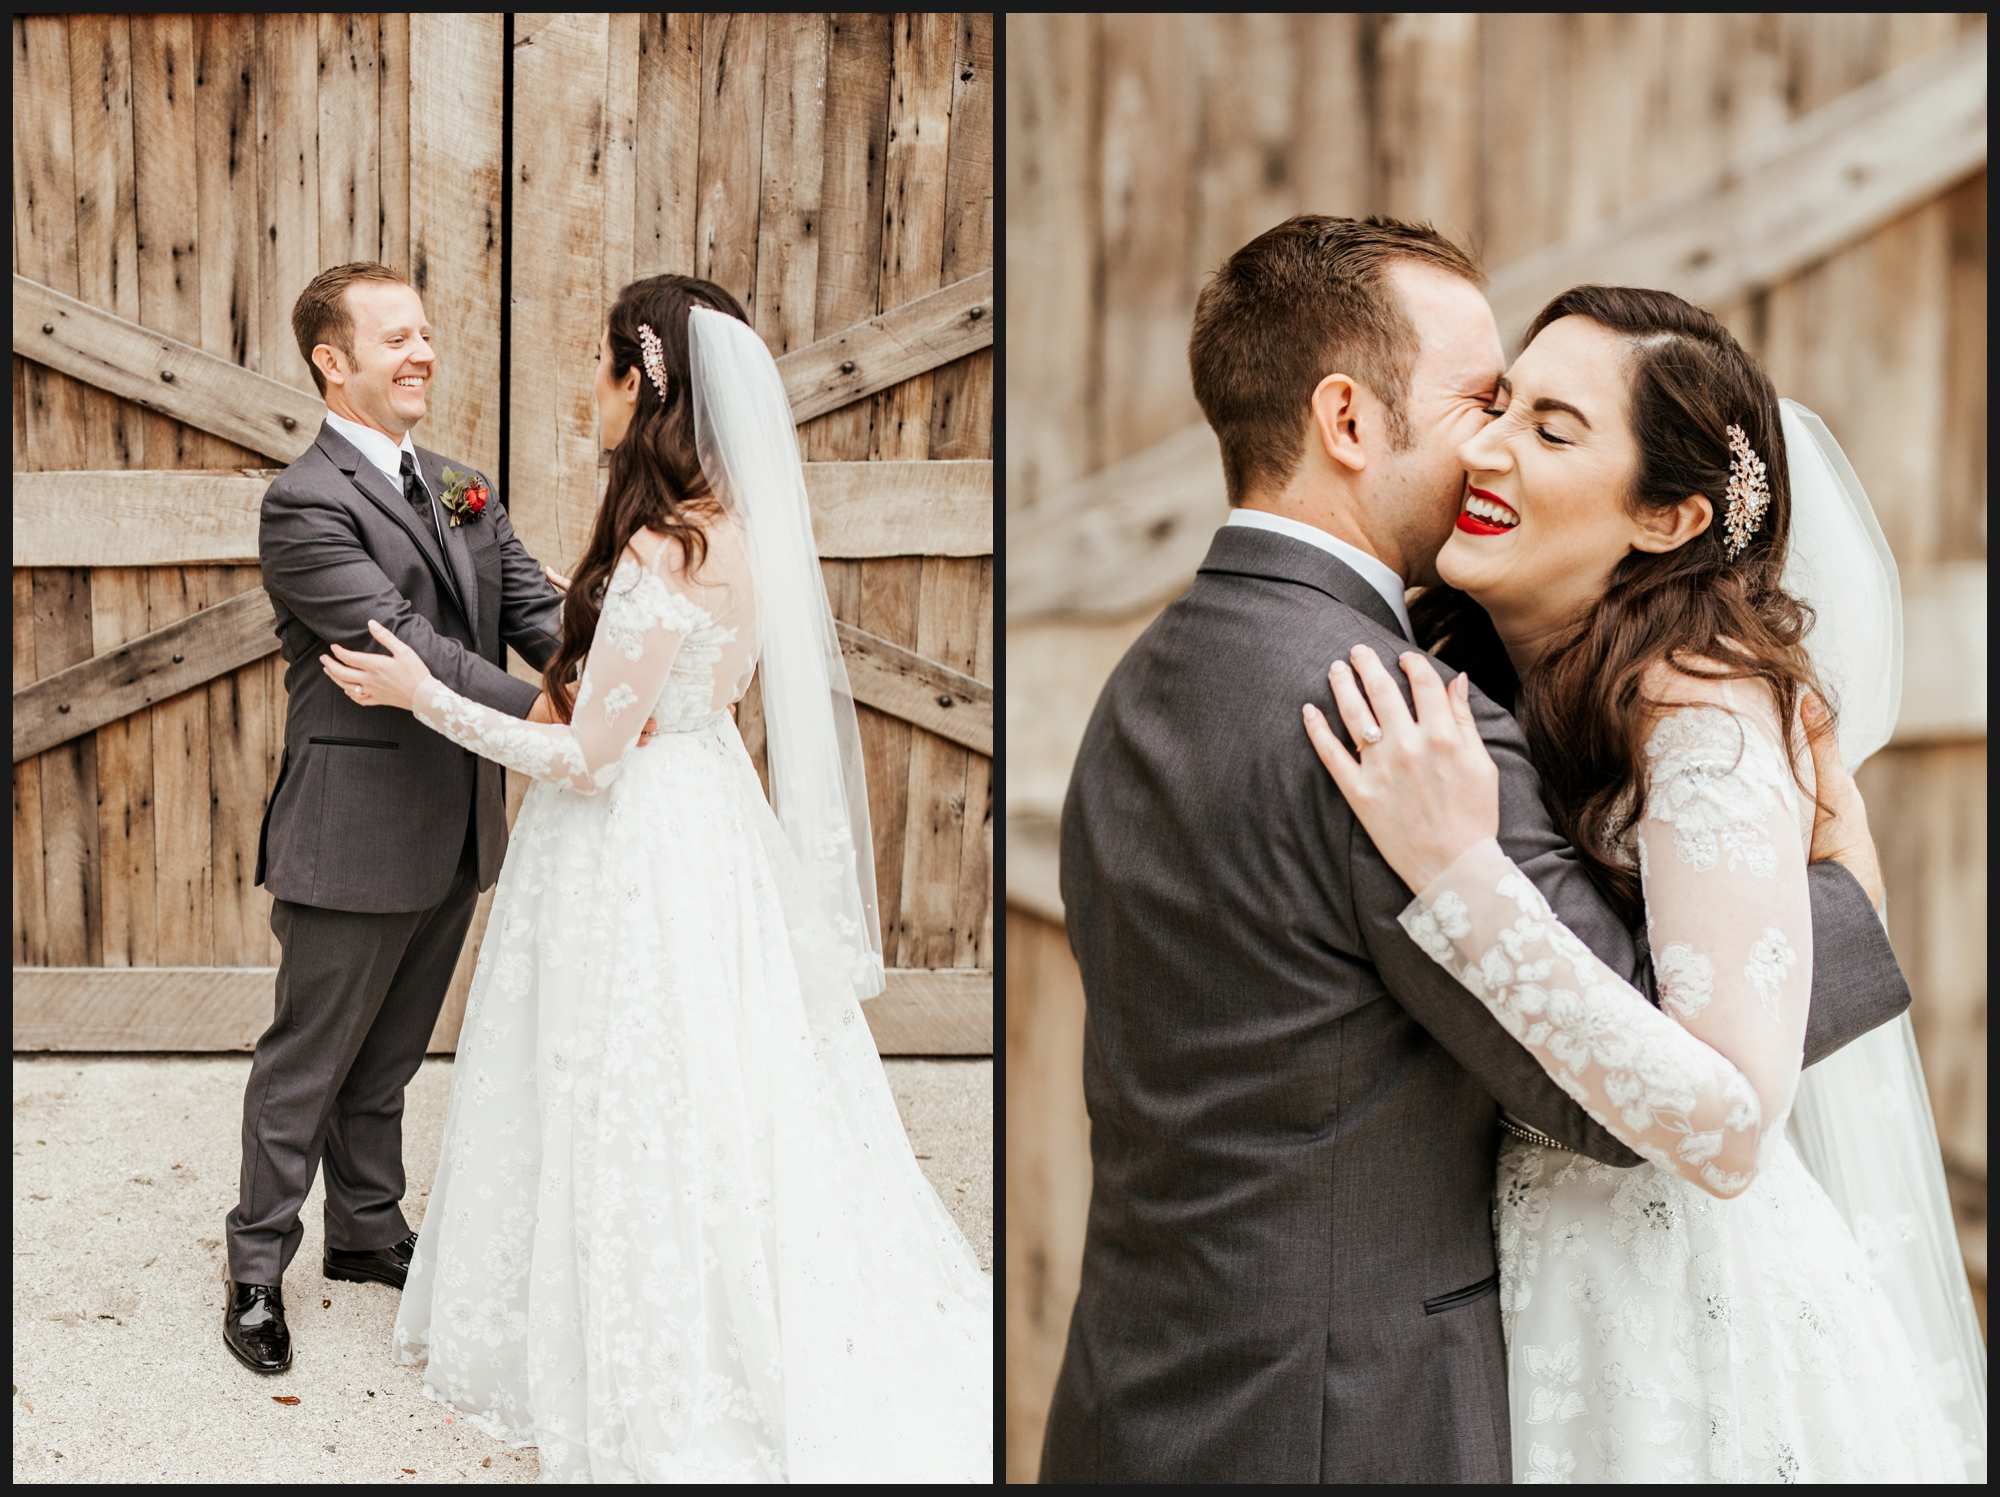 Orlando-Wedding-Photographer-destination-wedding-photographer-florida-wedding-photographer-hawaii-wedding-photographer_0473.jpg